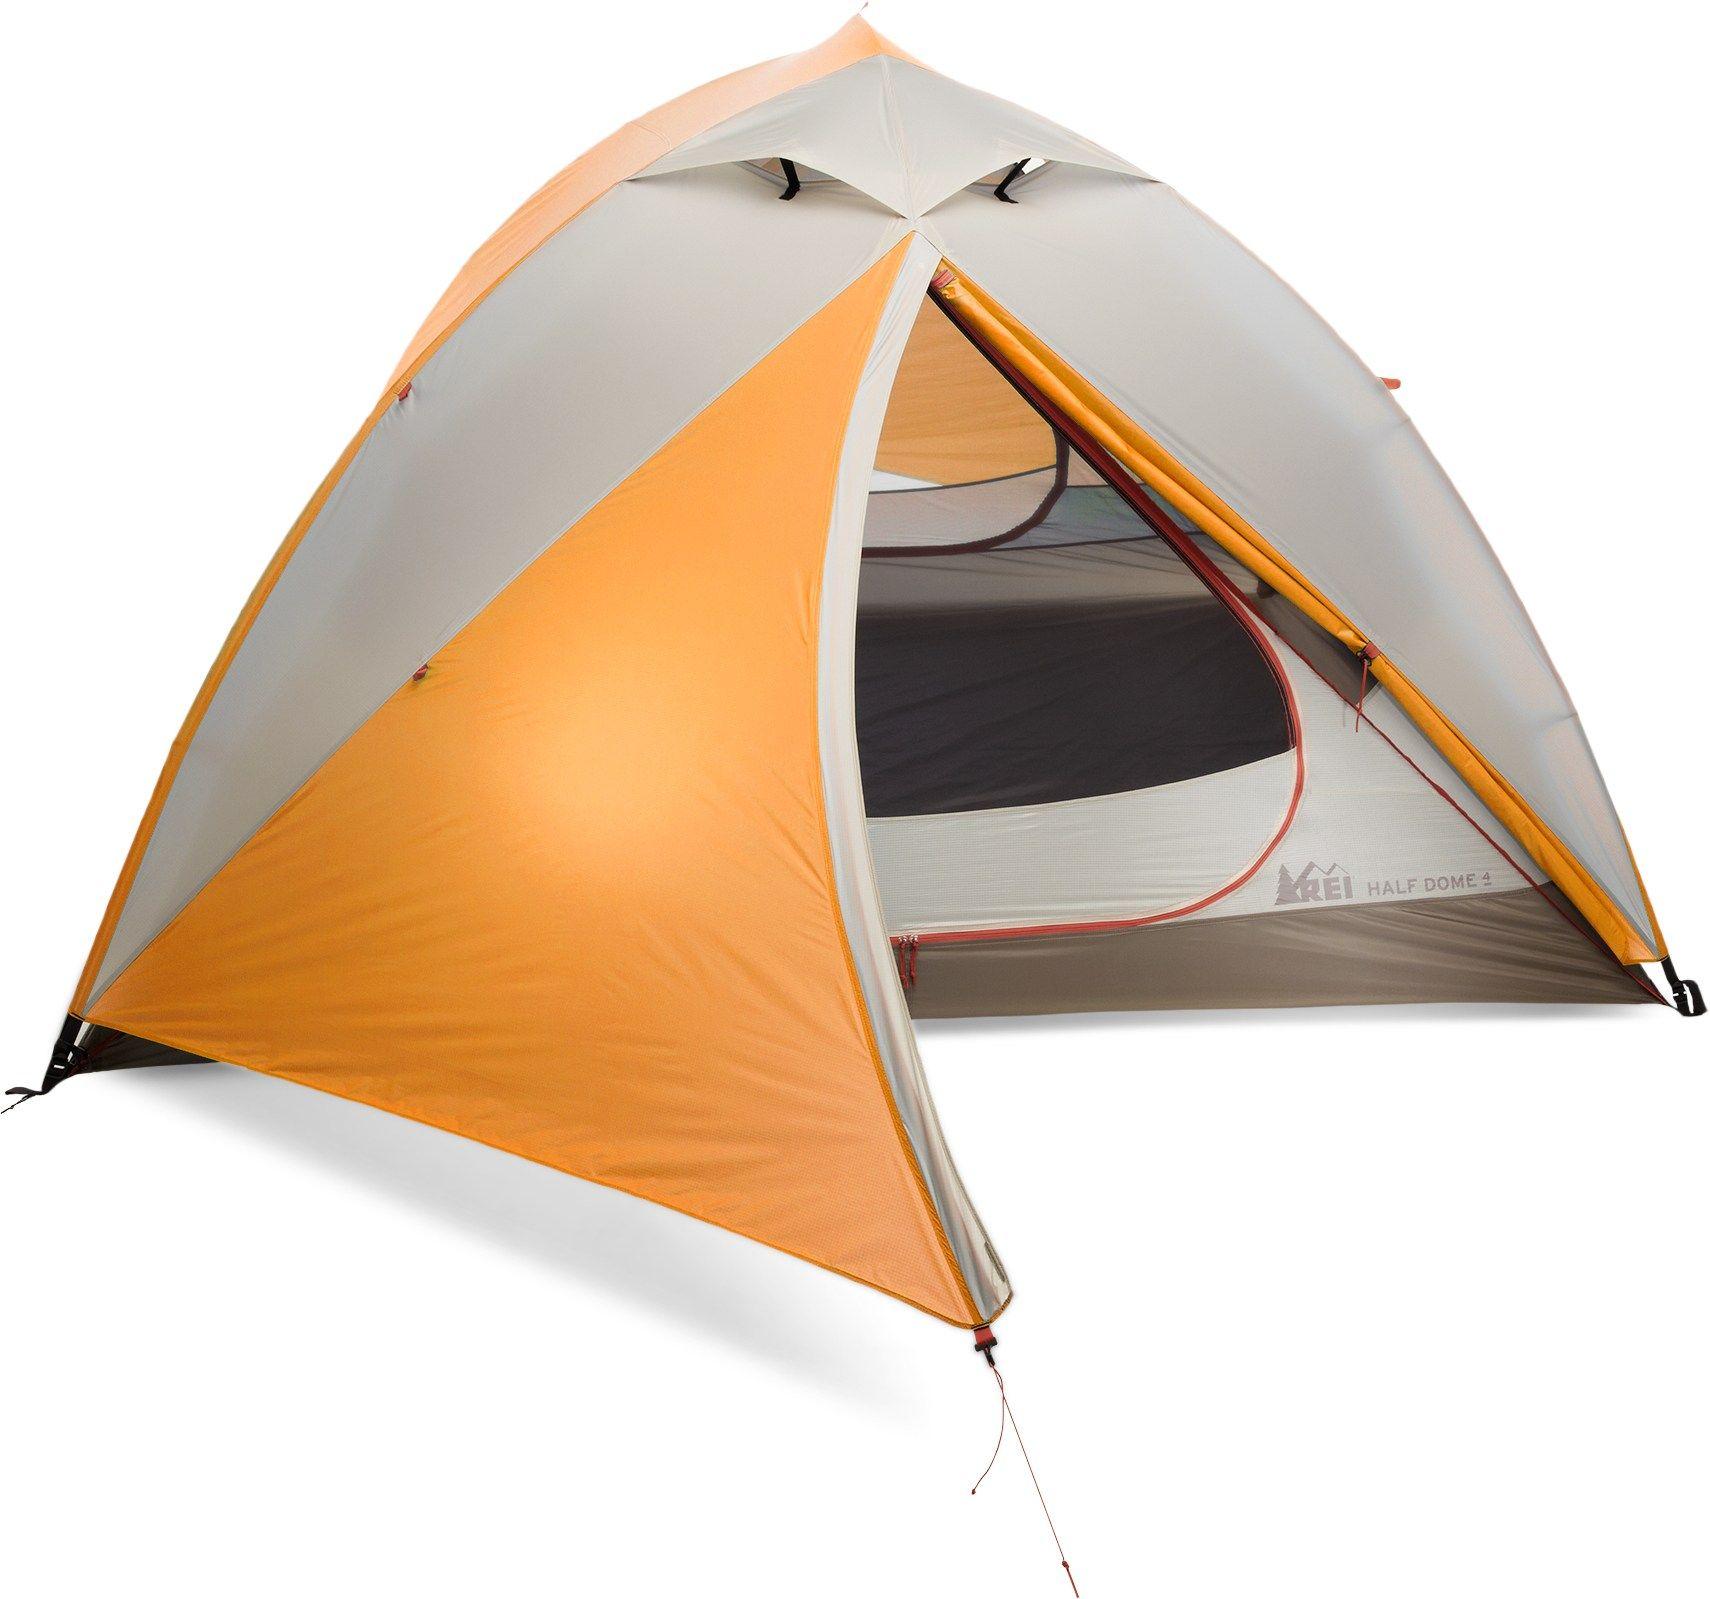 REI Half Dome 4 Tent - REI.com  sc 1 st  Pinterest & REI Half Dome 4 Tent - REI.com | Adventure Tiem | Tent Camping ...